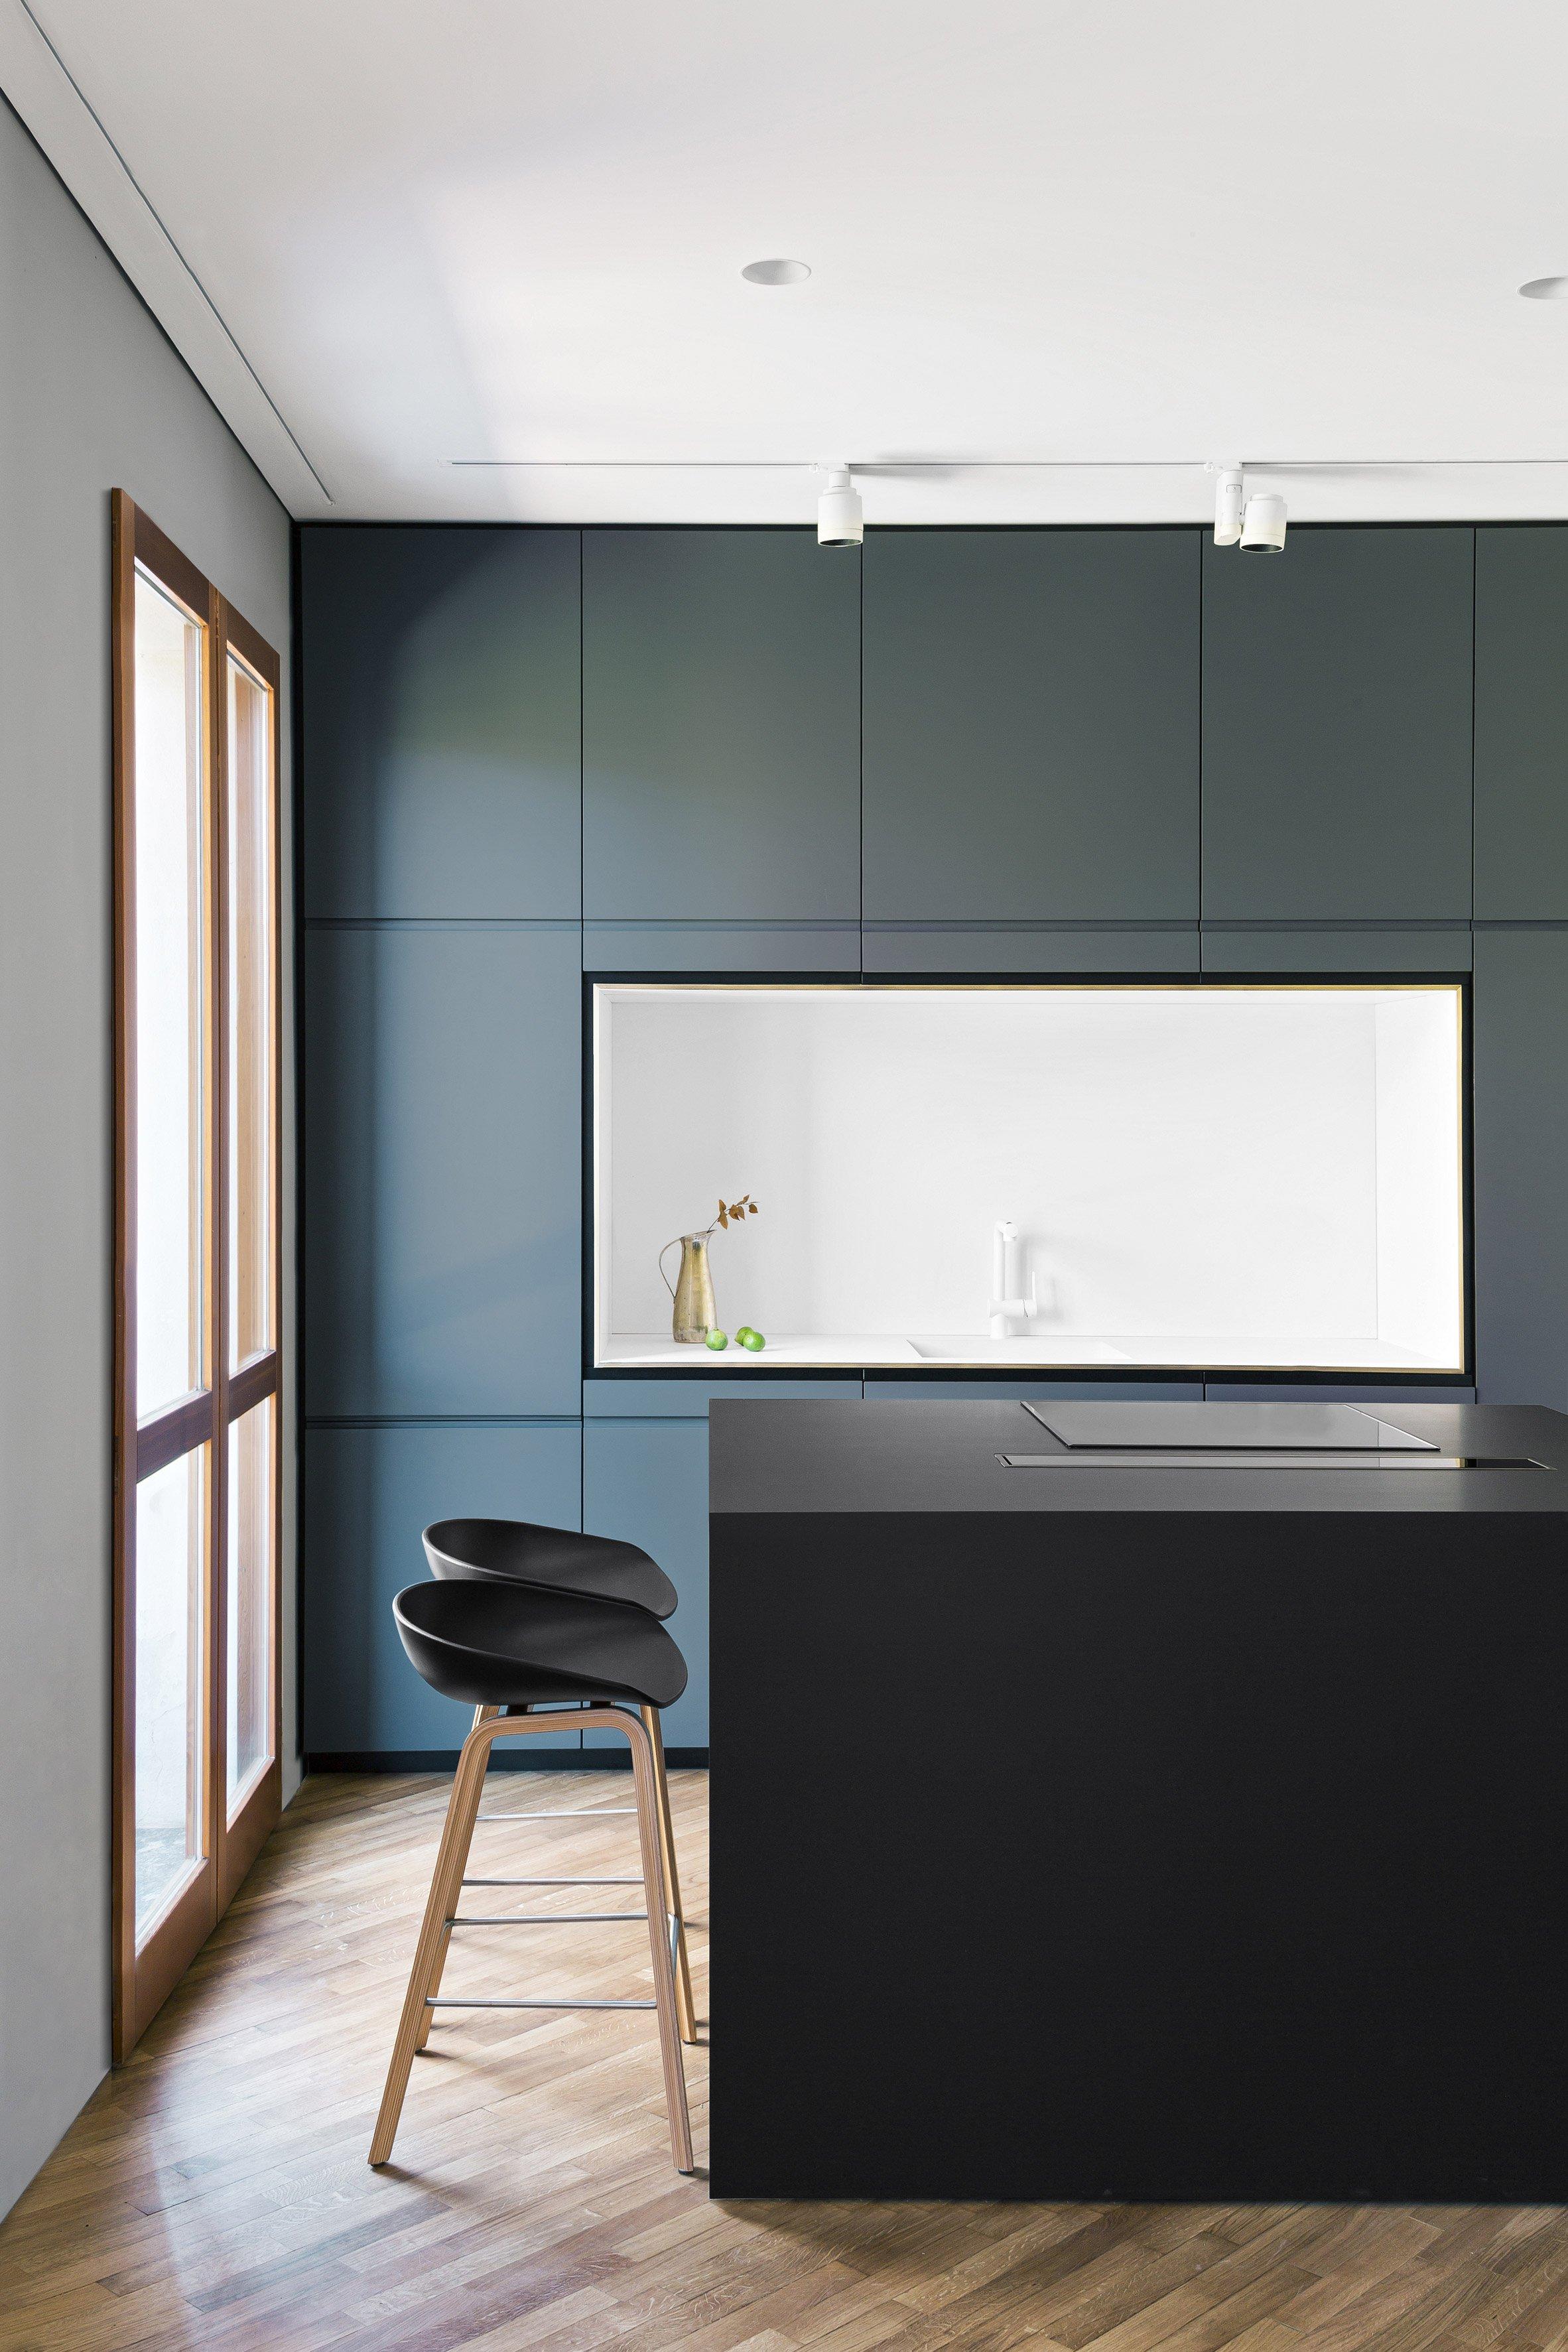 architecture-house-residential-design-studia-interiors-osnovadesign-osnova-poltava_11